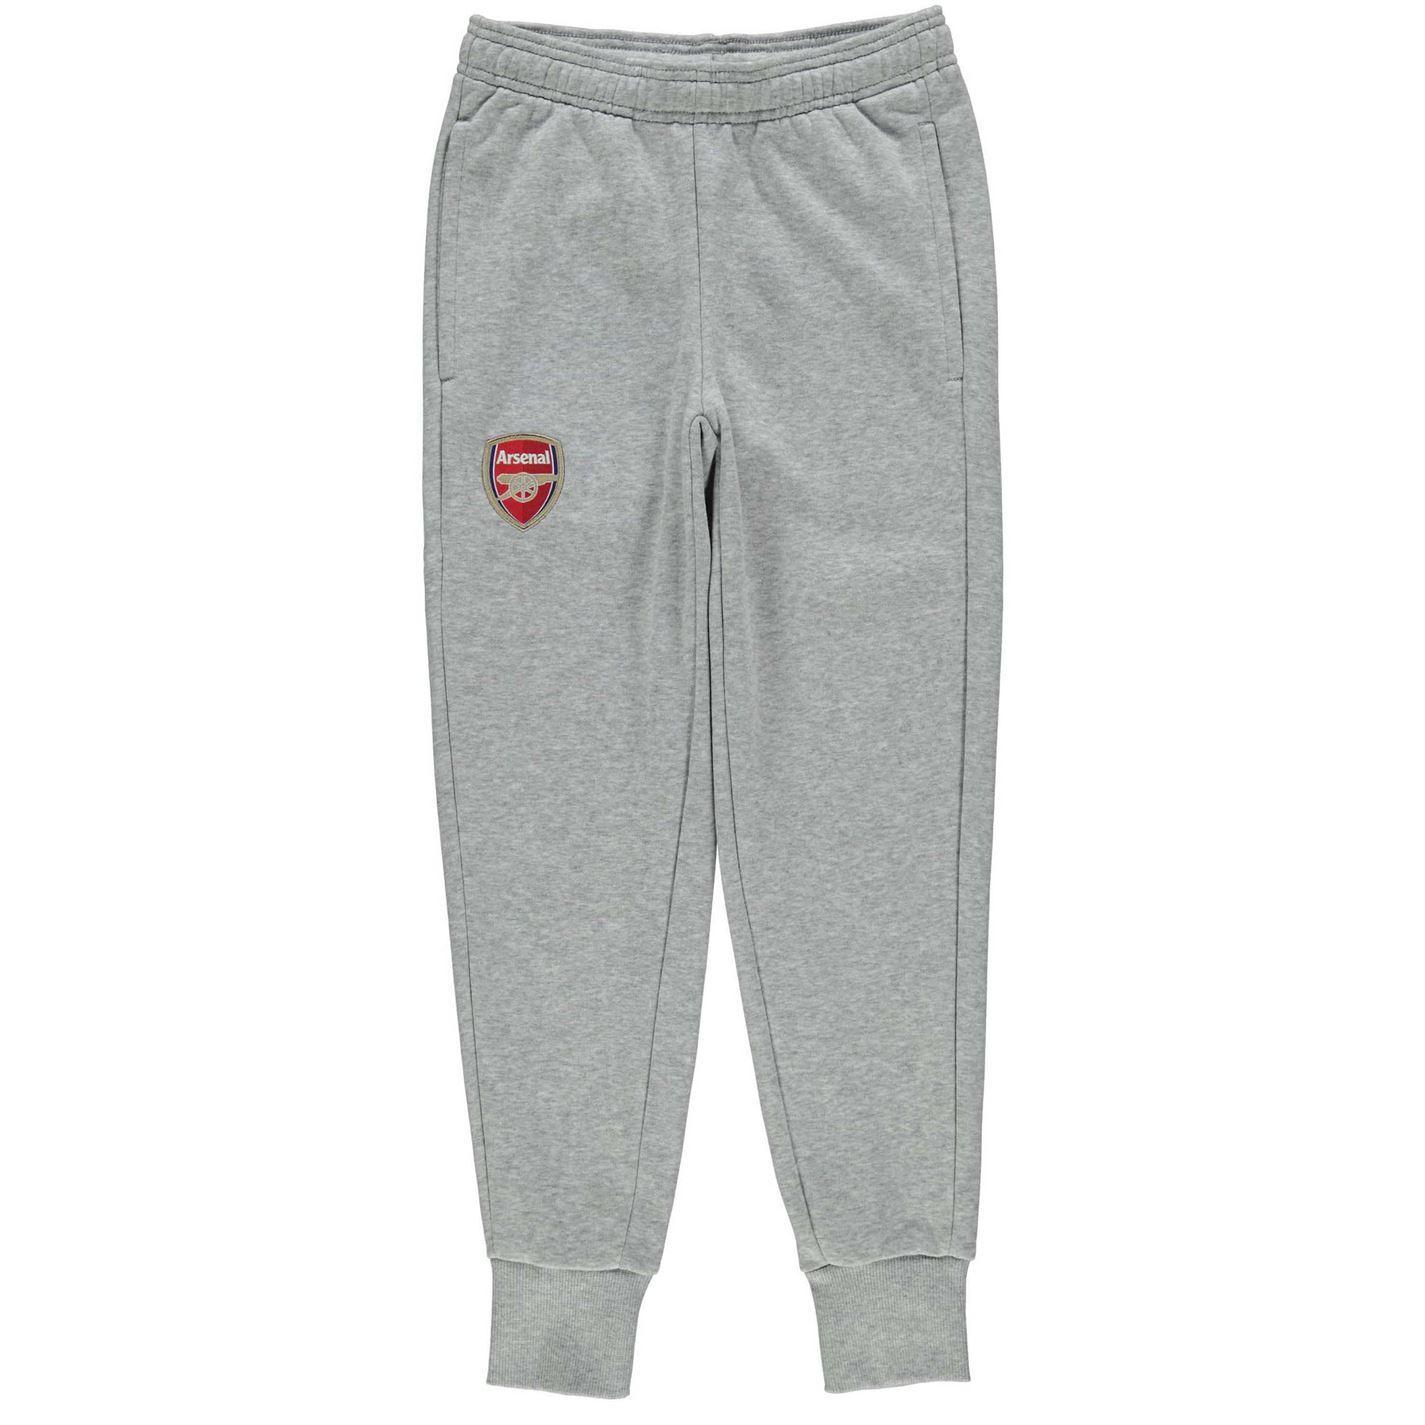 ac6dcbe537a9 ... Puma Arsenal Sweat Pants Juniors Grey Football Soccer Track Bottoms ...